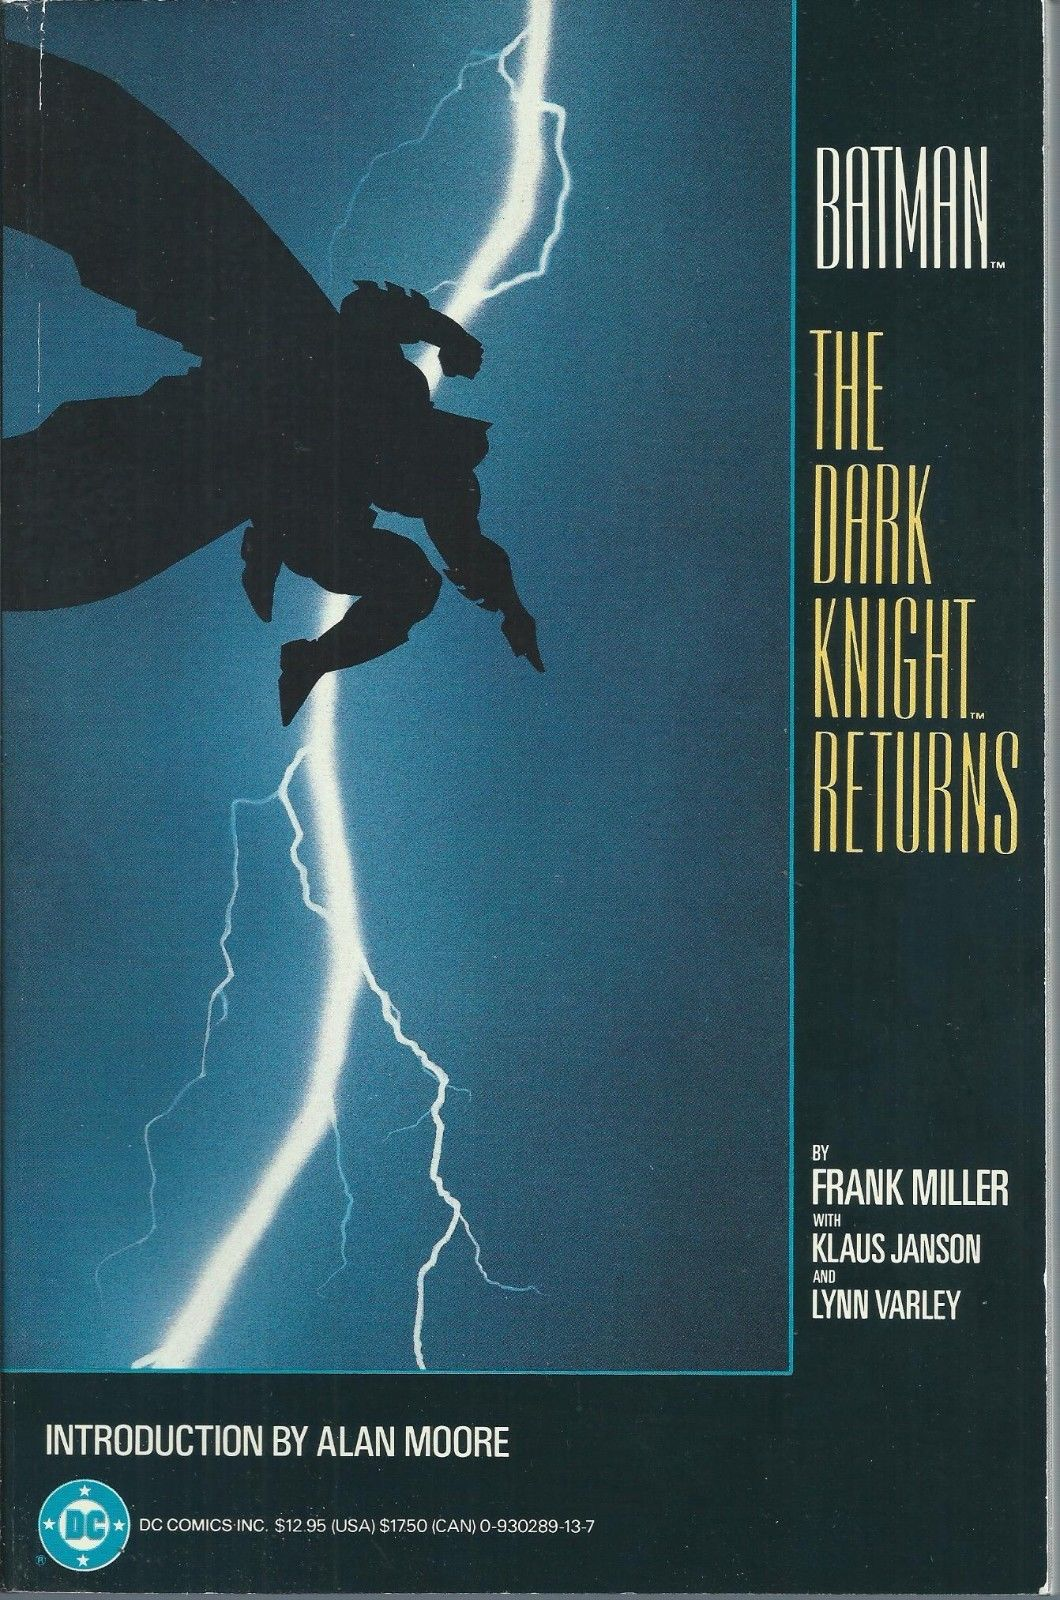 **BATMAN: THE DARK KNIGHT RETURNS TPB GRAPHIC NOVEL**(1986, DC)**1ST PRINT**VF**